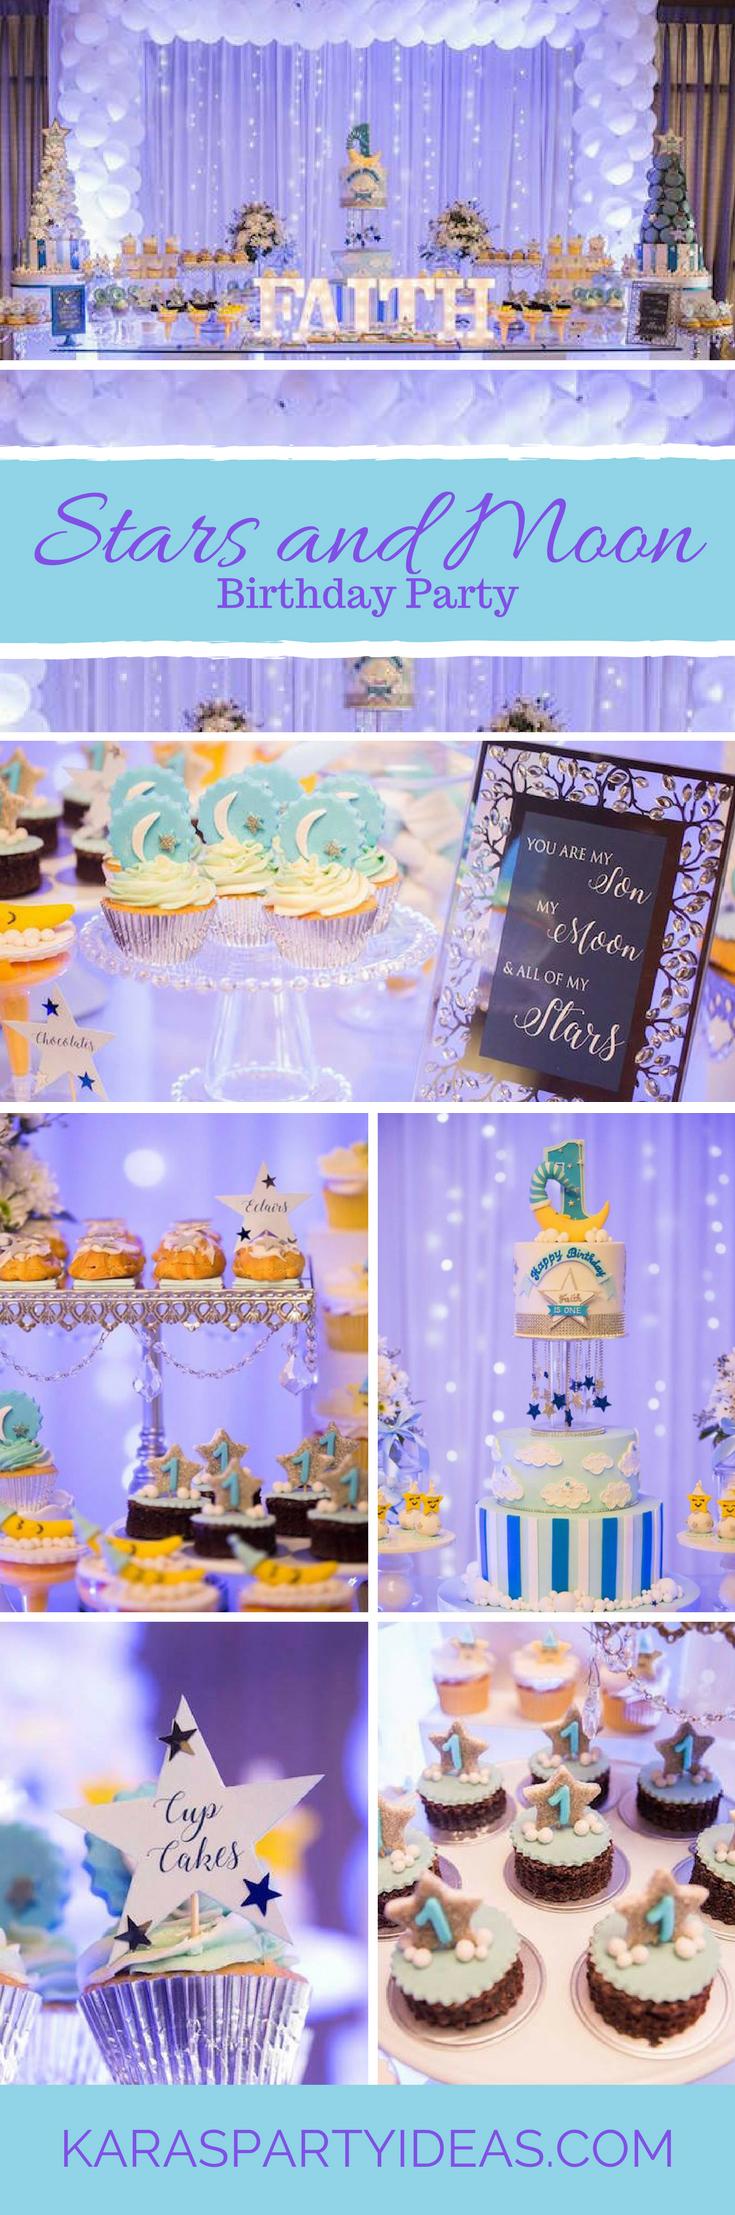 Stars and Moon Birthday Party via Karas Party Ideas - KarasPartyIdeas.com